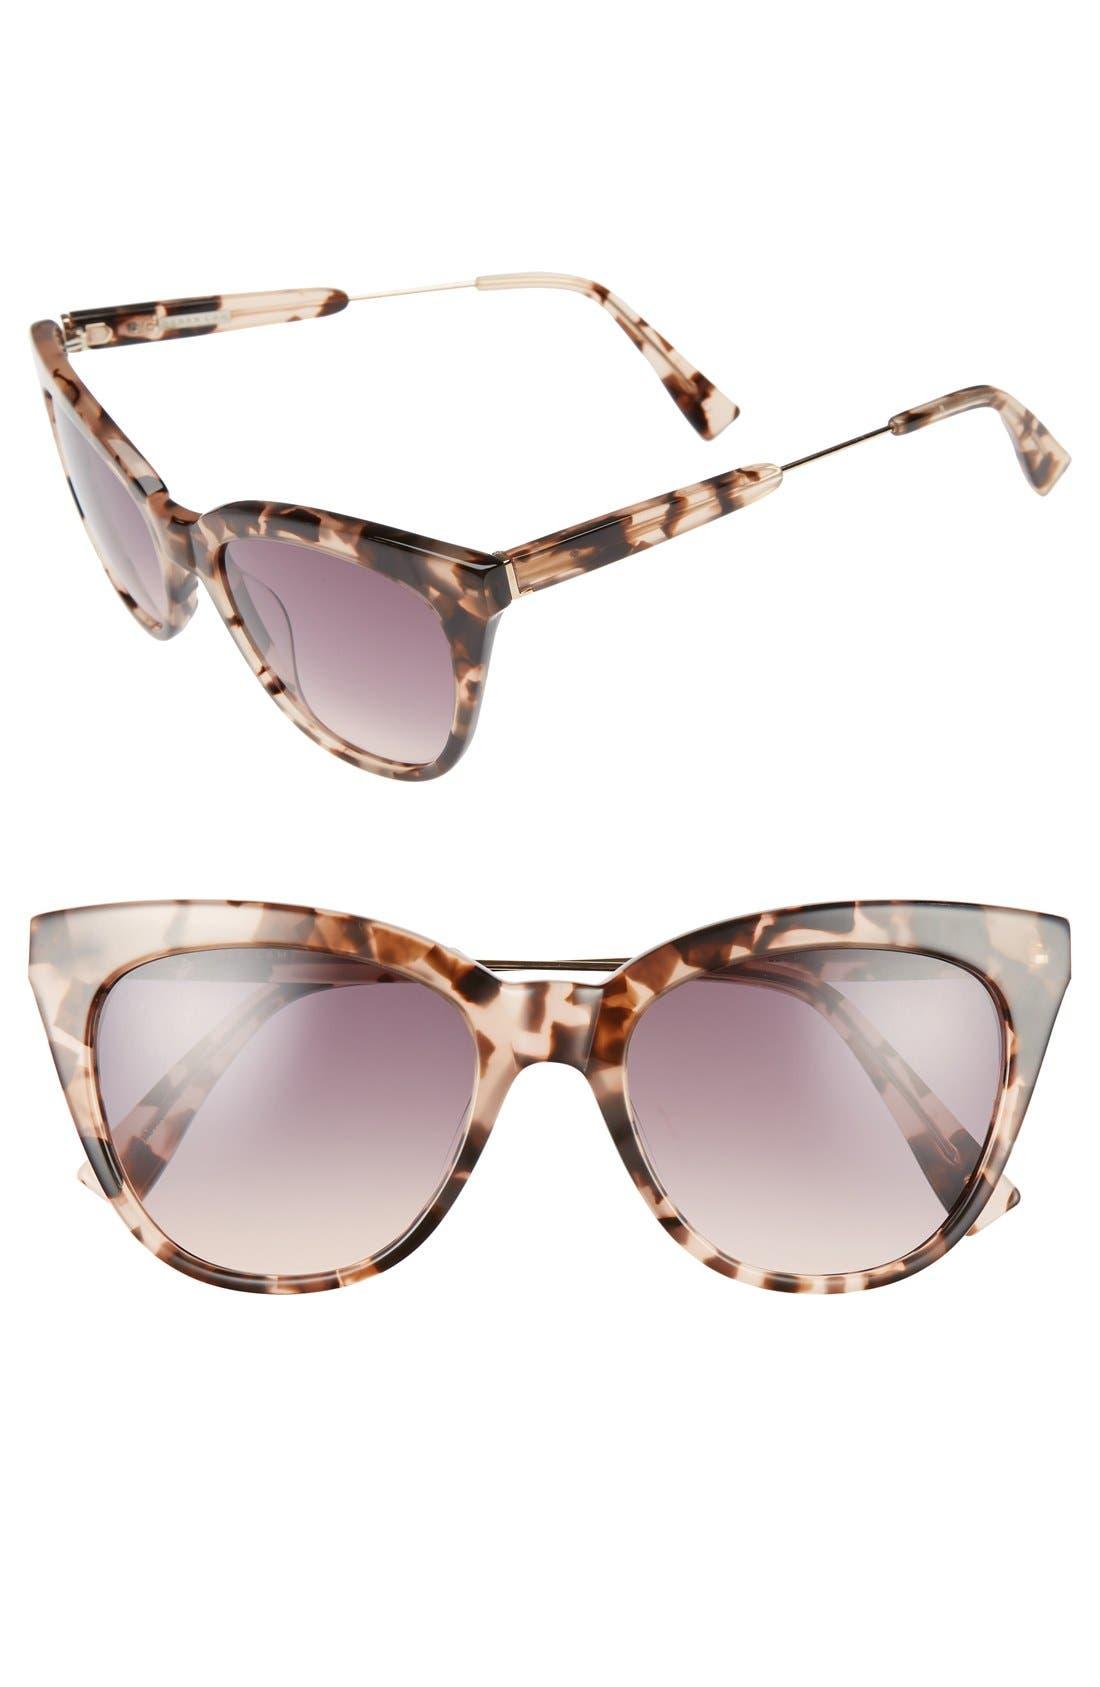 Main Image - Derek Lam 'Lenox' 53mm Cat Eye Sunglasses